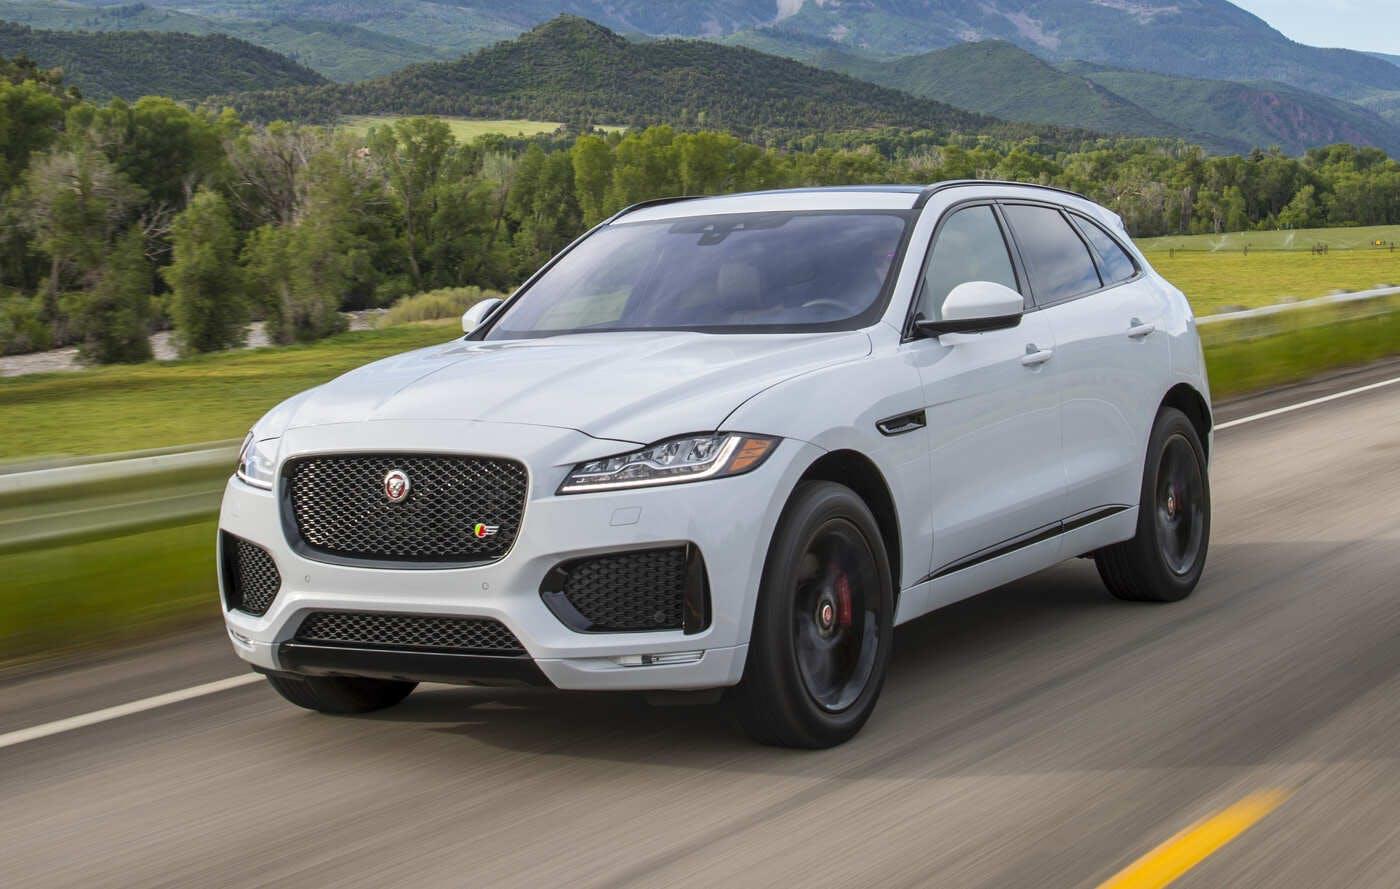 2020 Jaguar F Pace Reviews Pricing Pictures Truecar